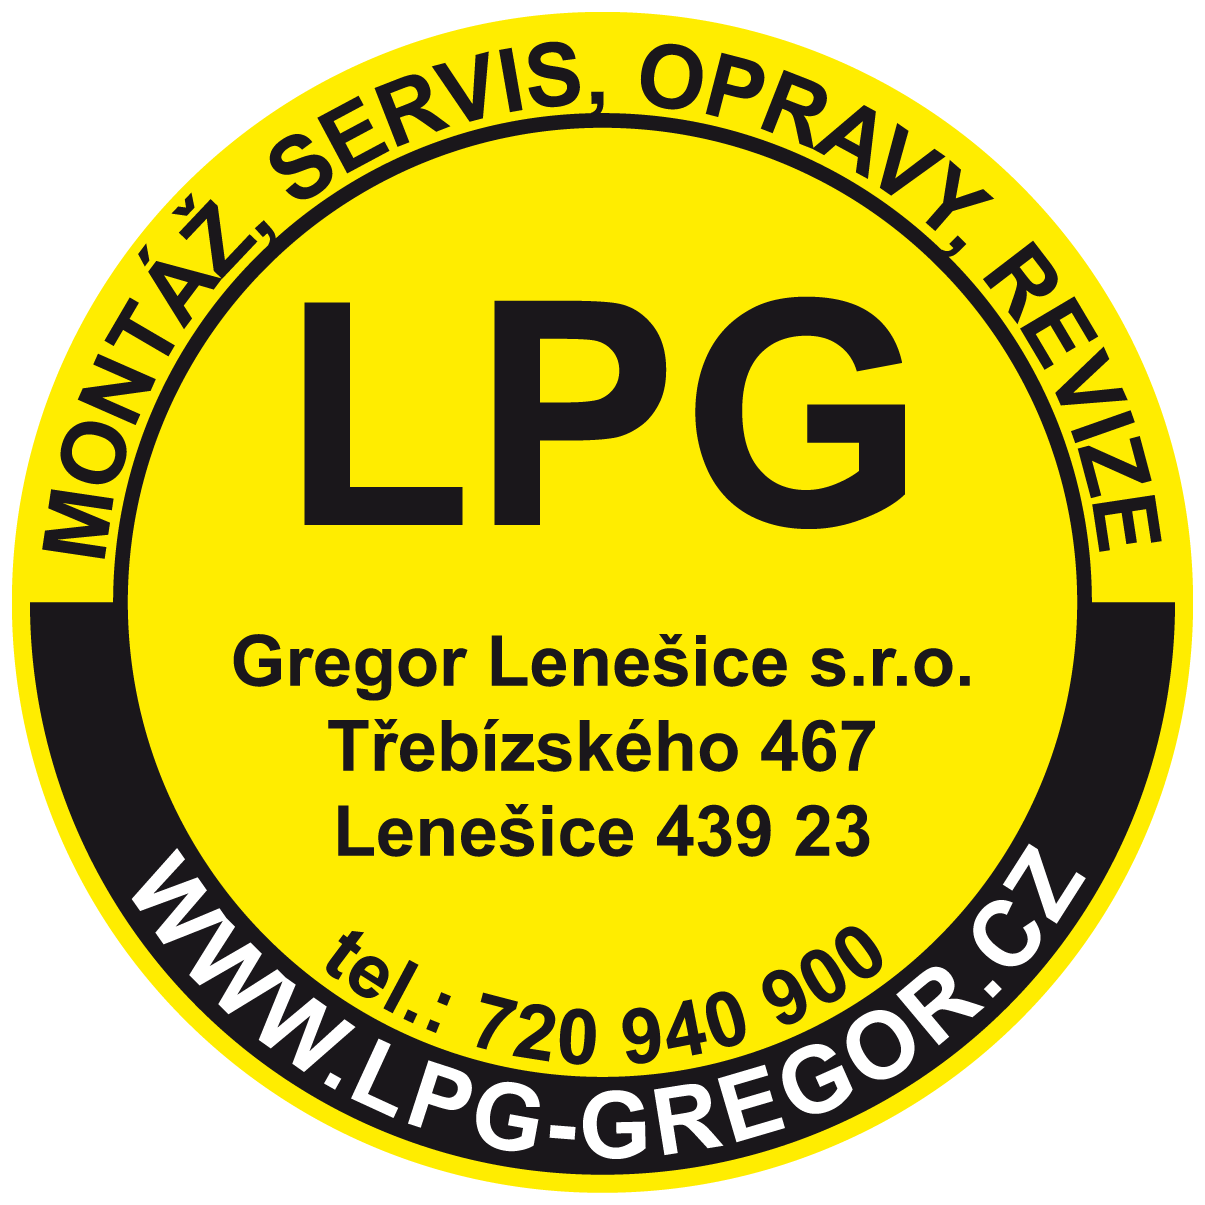 Gregor Lenešice s.r.o.